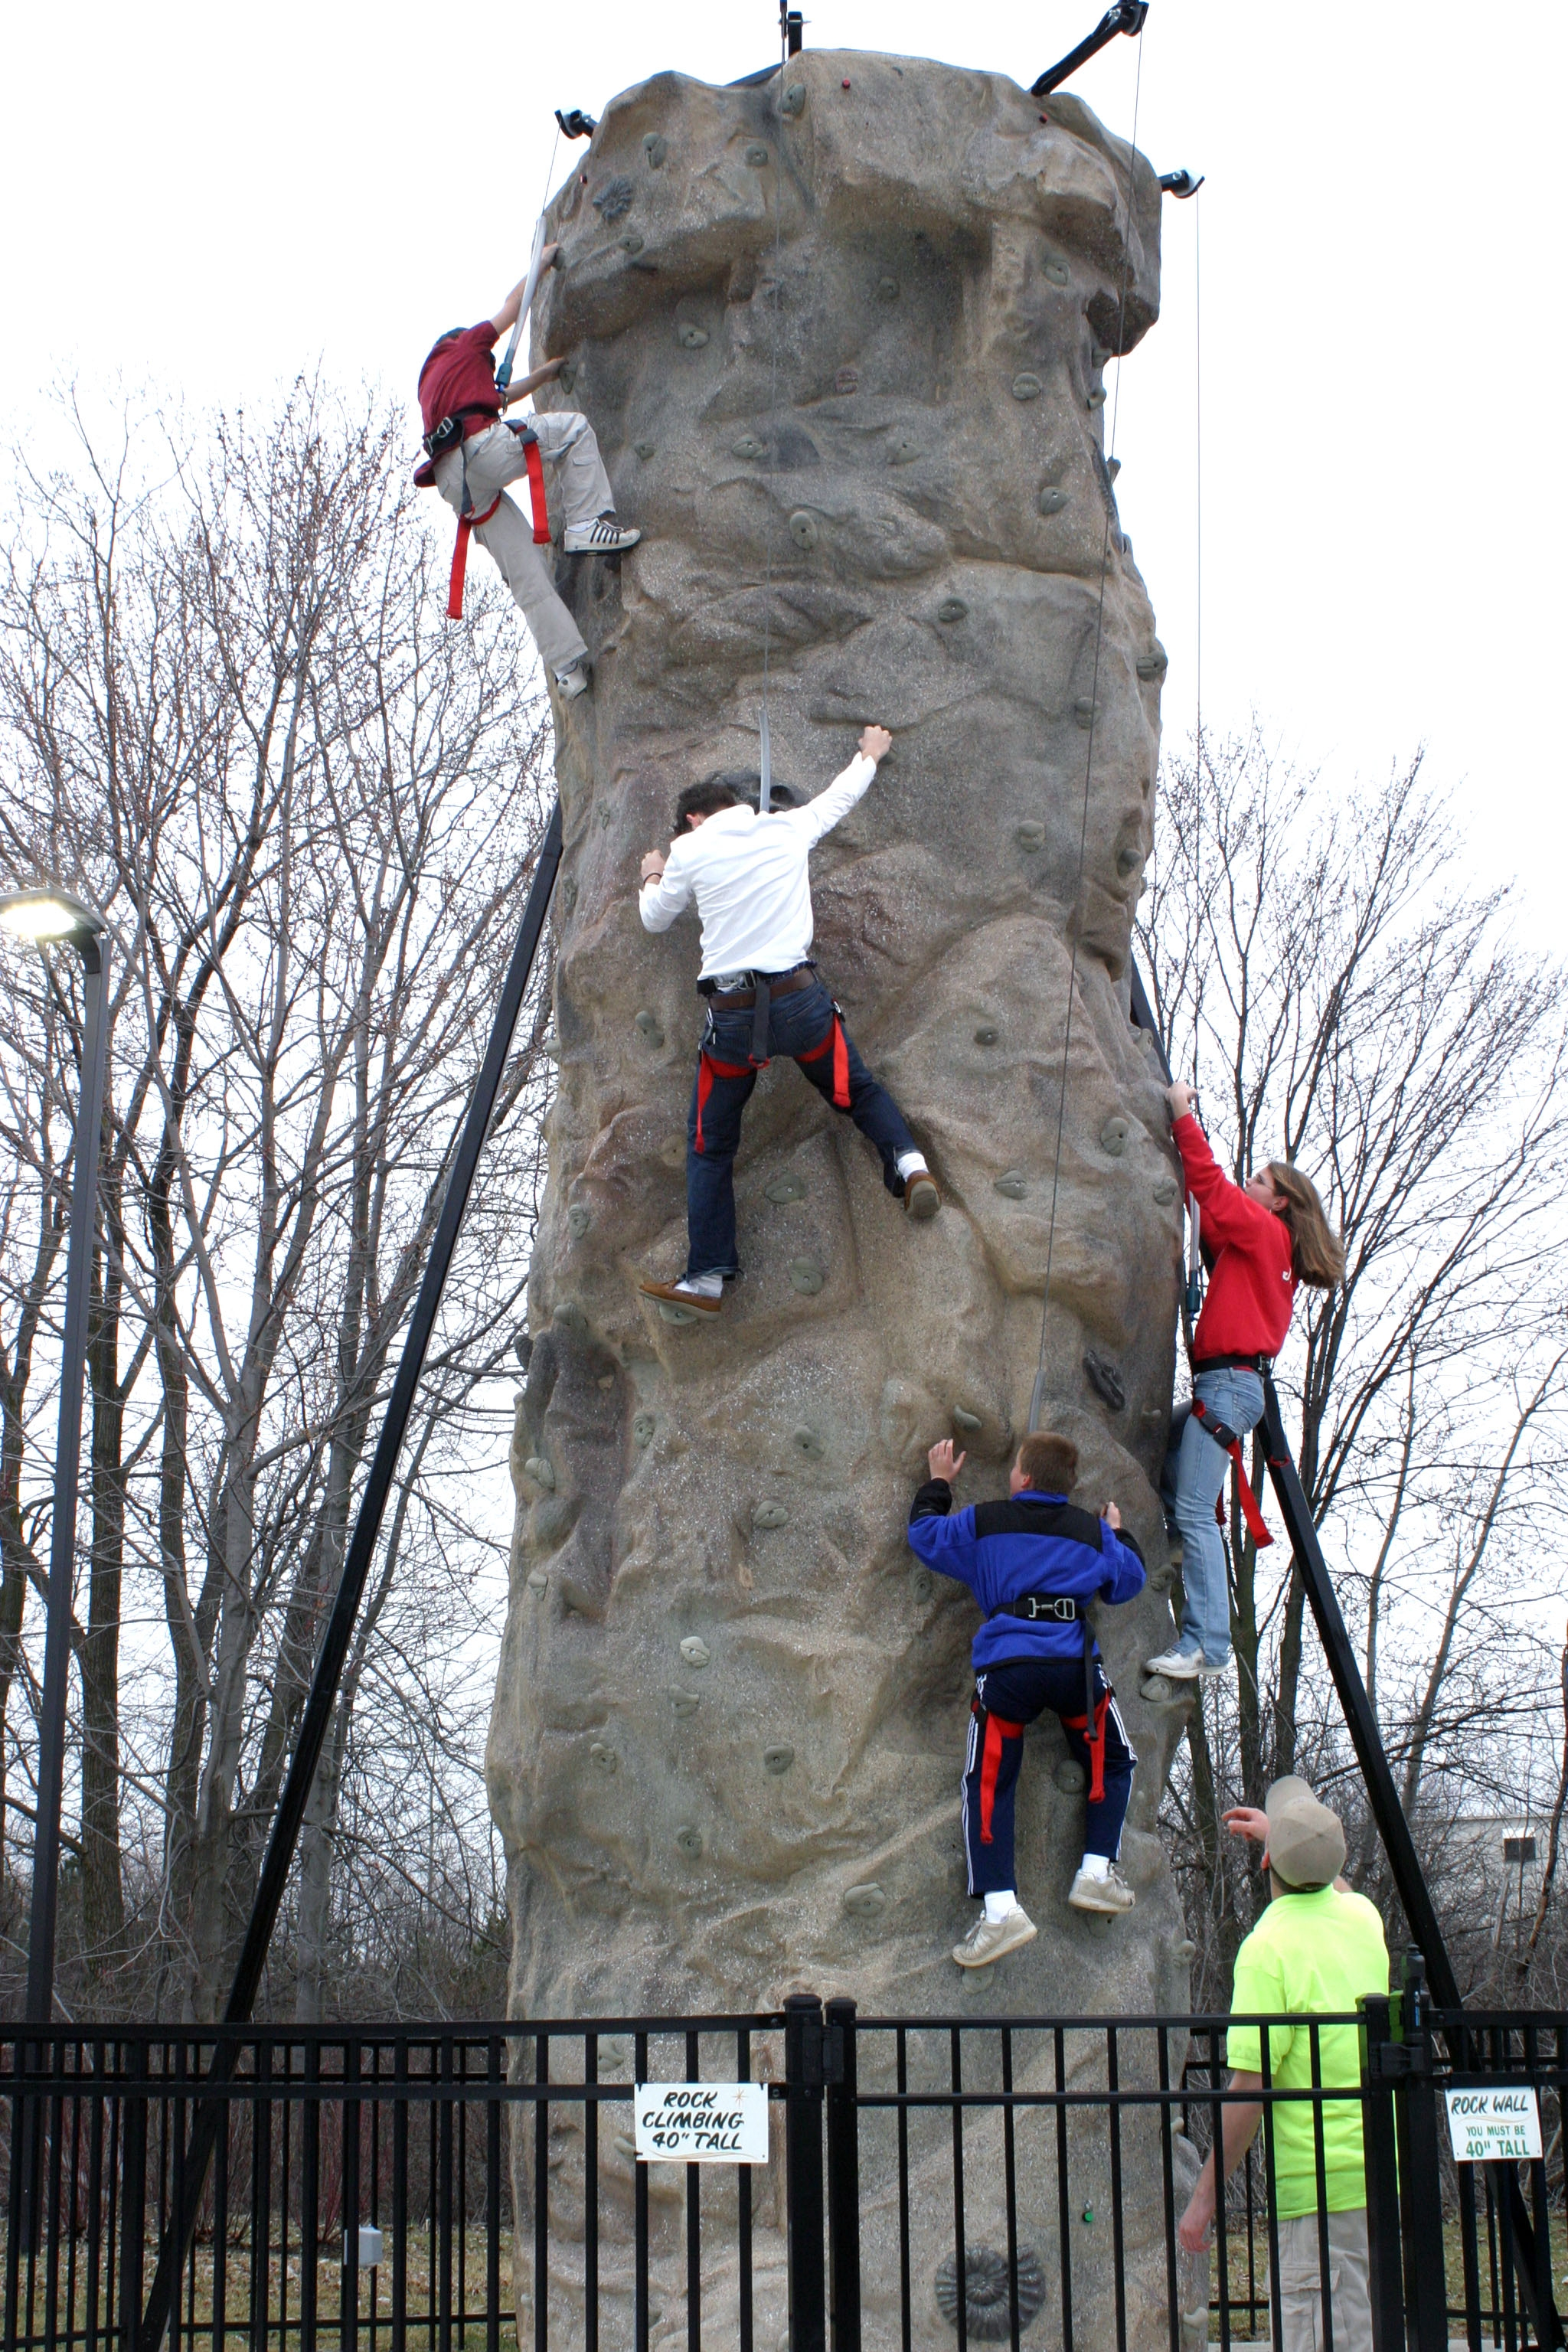 Clmb Wall 7